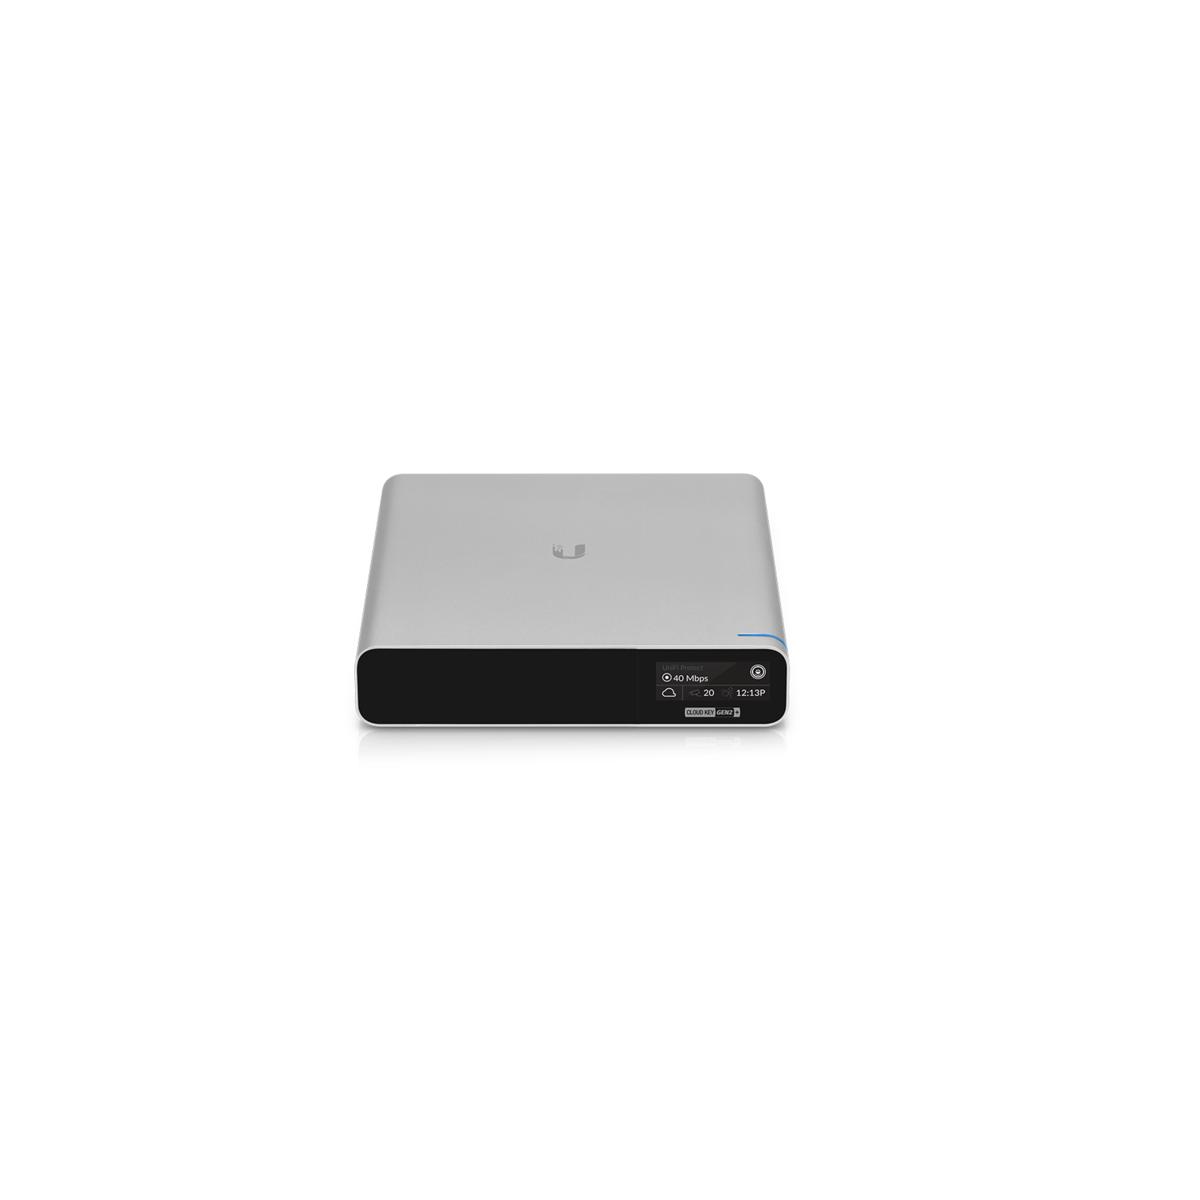 Ubiquiti EdgeRouter PRO 8 8x Gigabit Ethernet